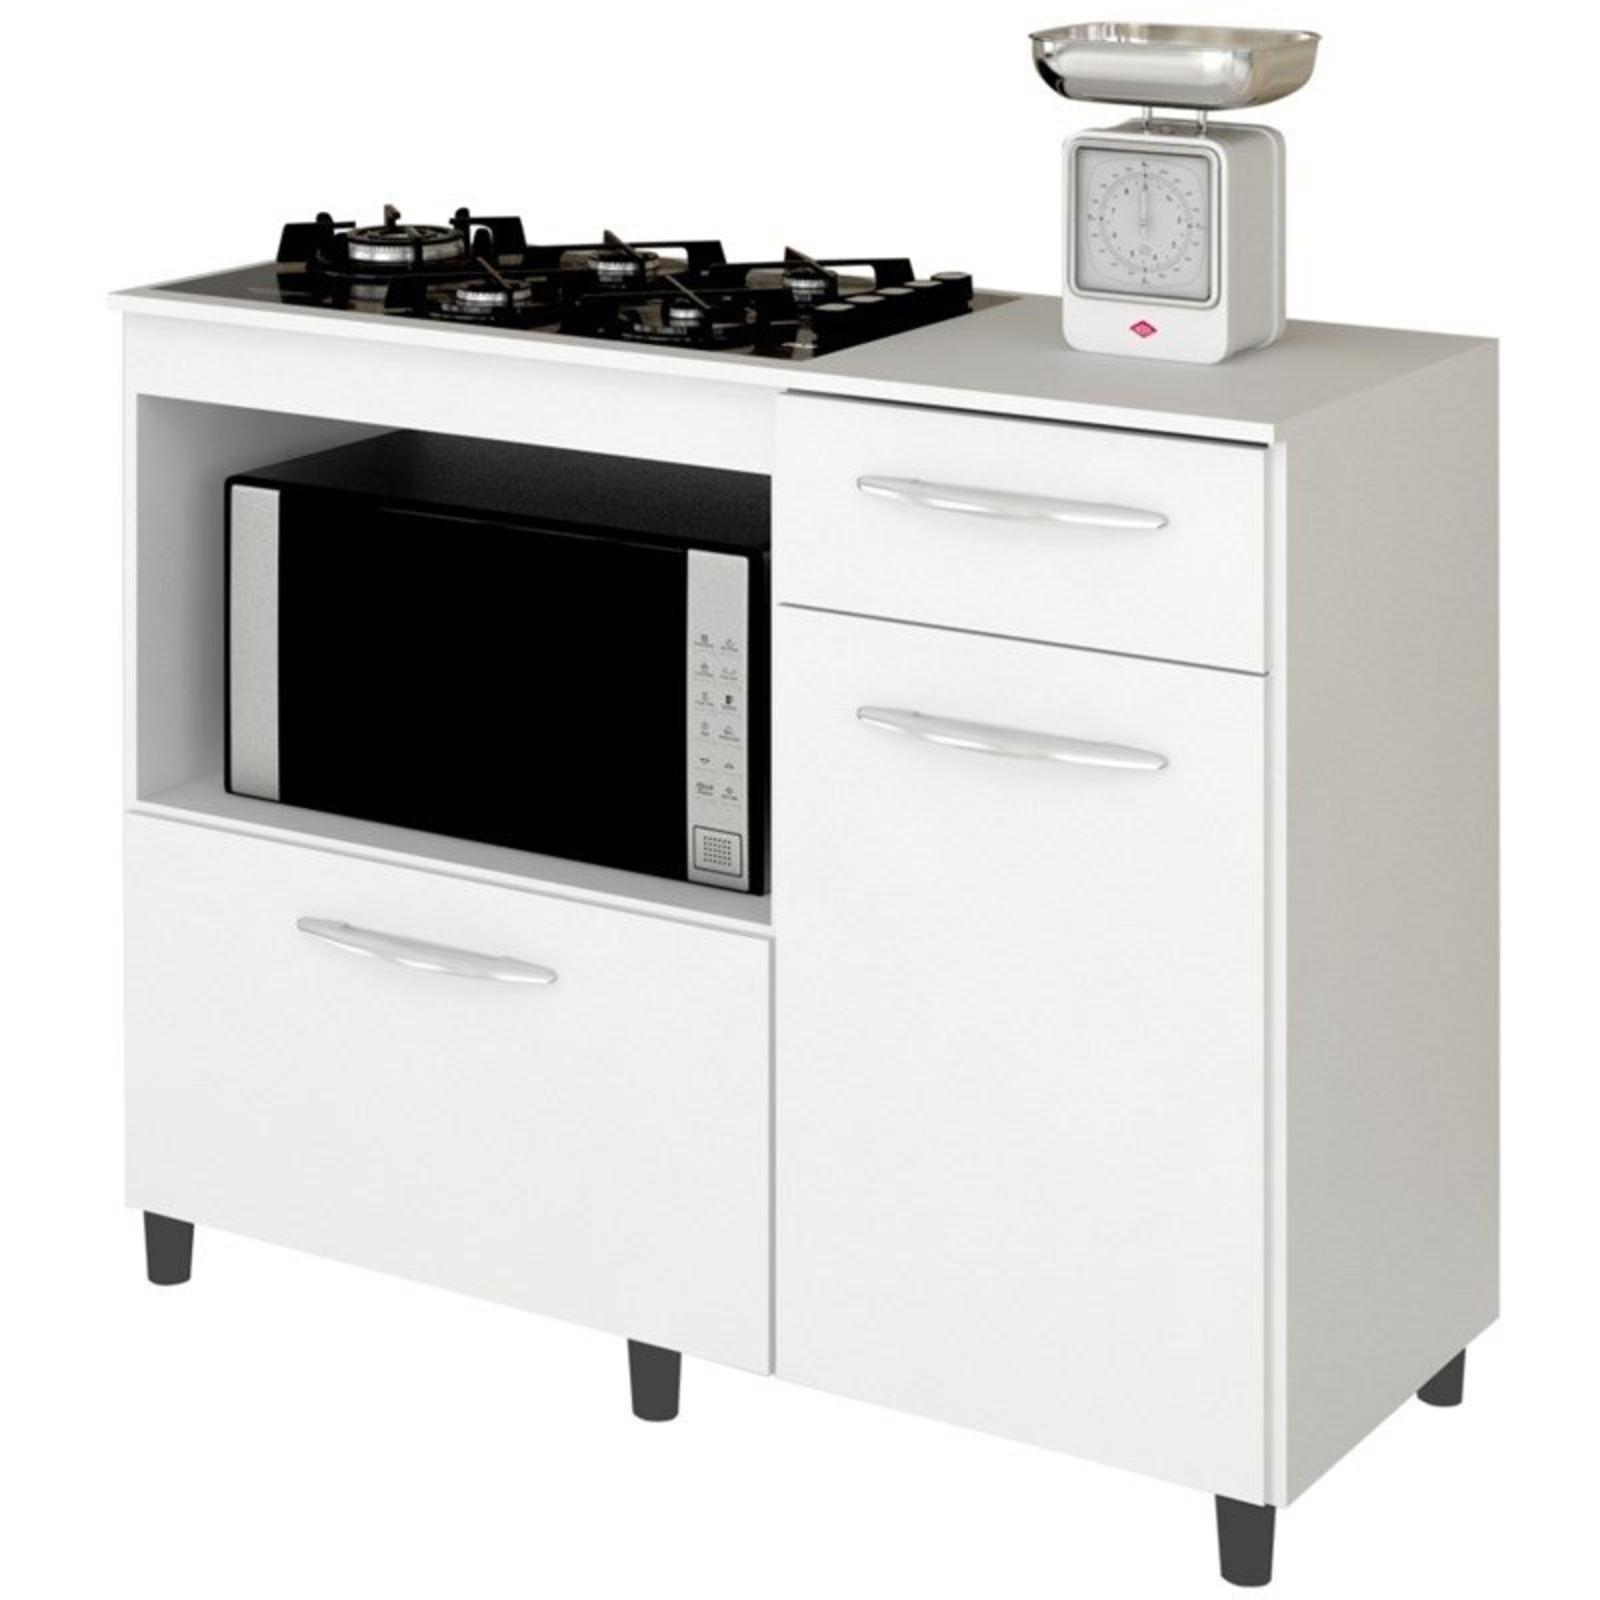 Balcao De Cozinha Cooktop E Forno Microondas Mali Branco Lumil